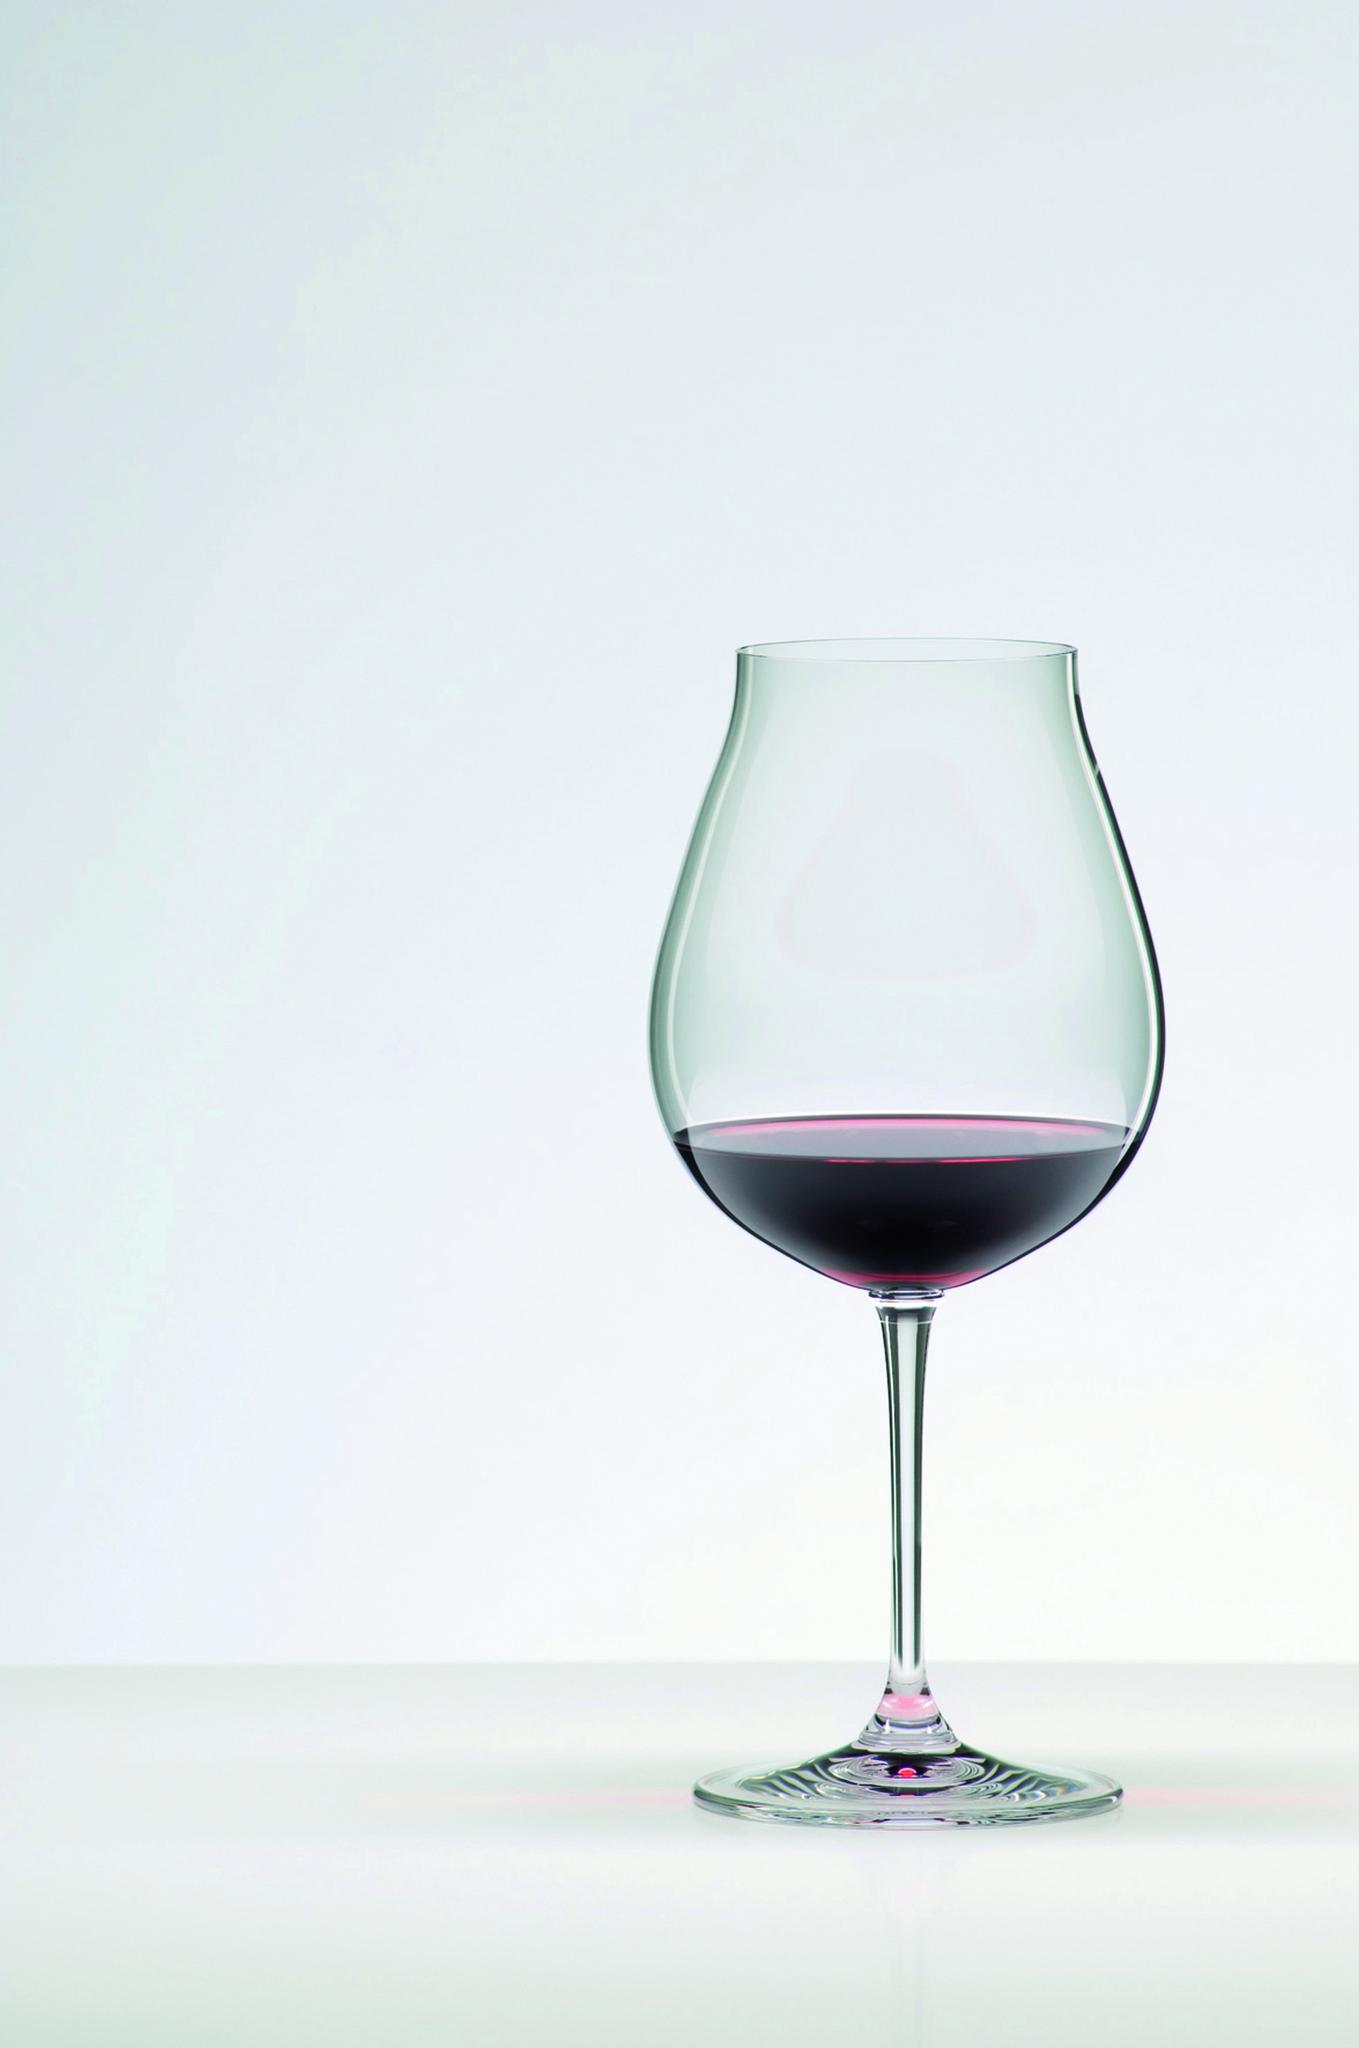 Бокалы Набор бокалов для красного вина 2шт 800мл Riedel Vinum XL Pinot Noir nabor-bokalov-dlya-krasnogo-vina-2-sht-800-ml-riedel-vinum-xl-pinot-noir-avstriya.jpg